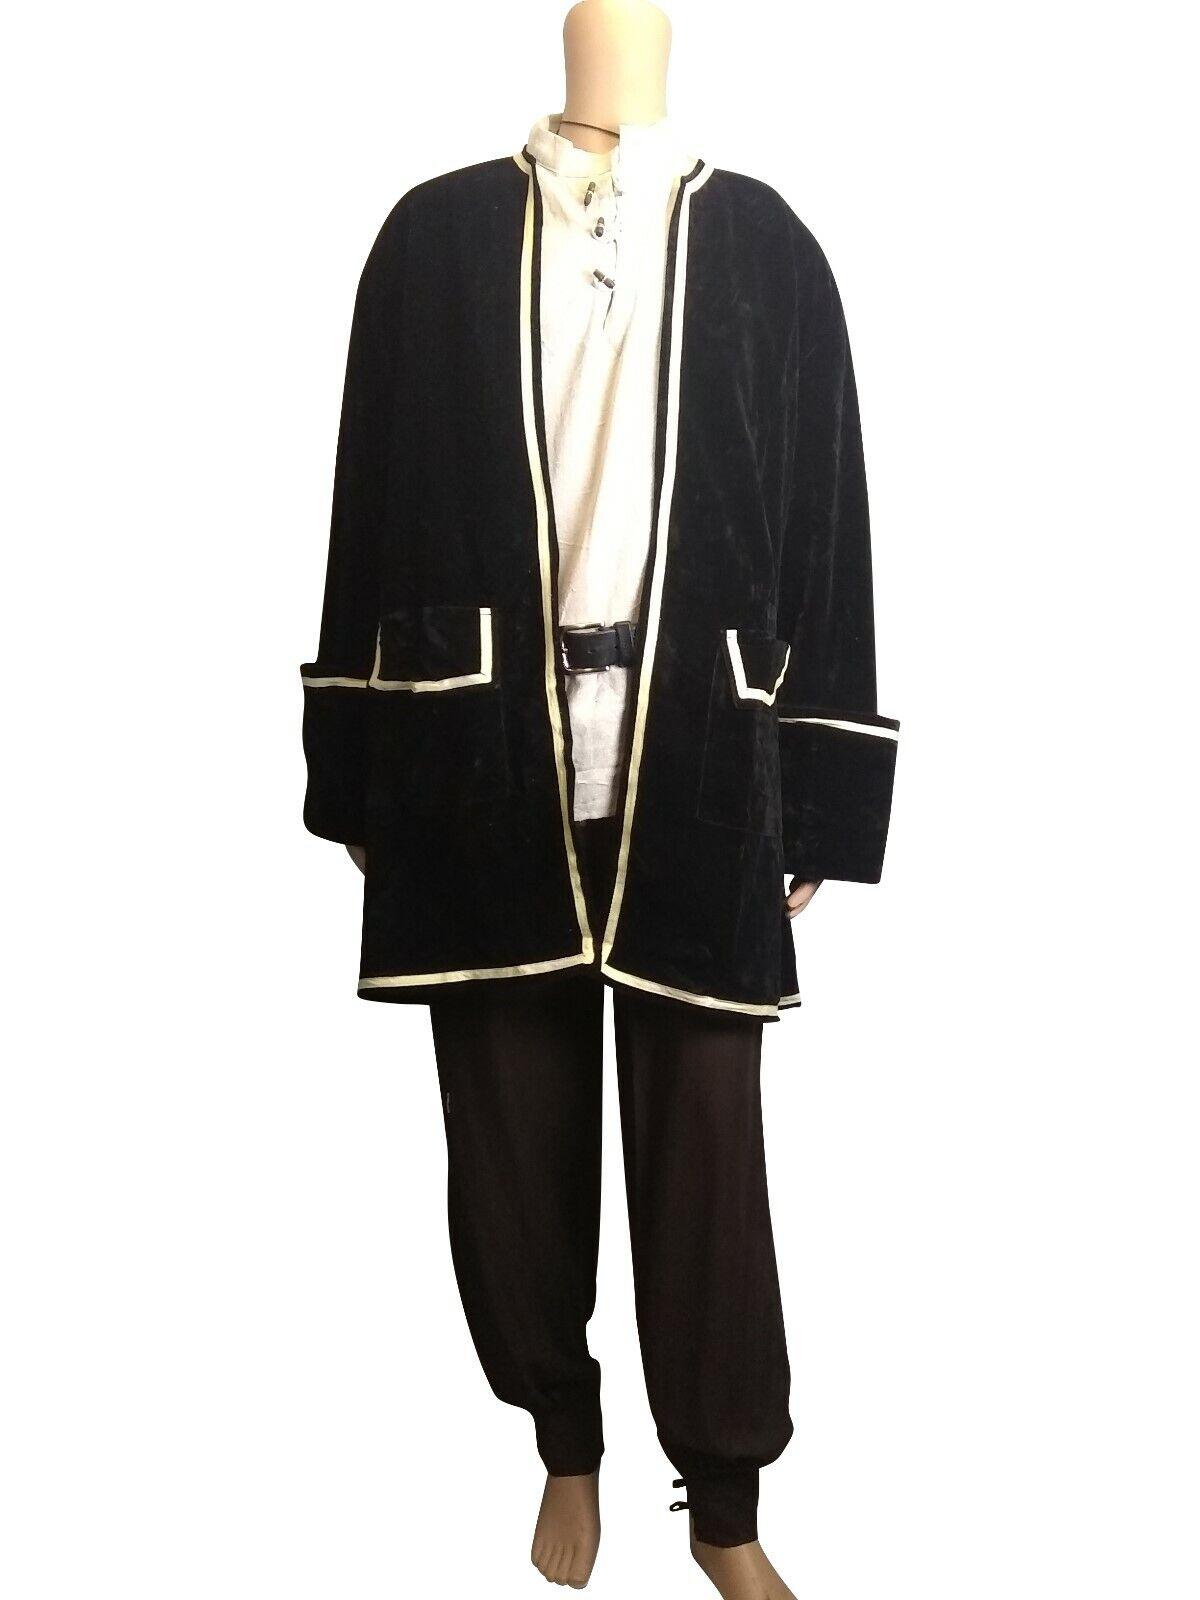 Frock Coat Jacket Velvet Pirate LARP Cosplay Fancy Dress Fits 38